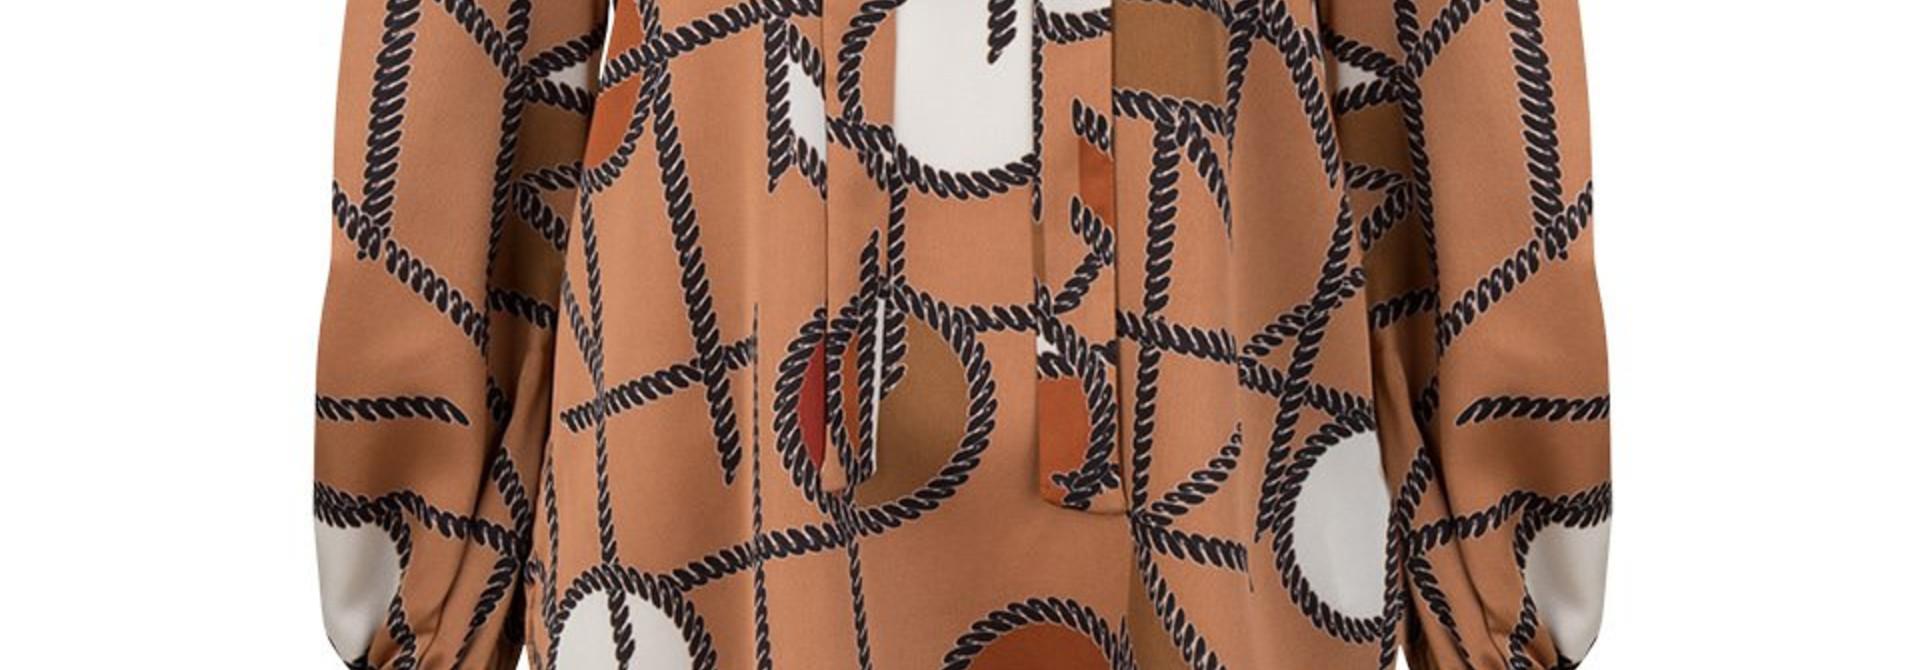 Miller chaint print blouse